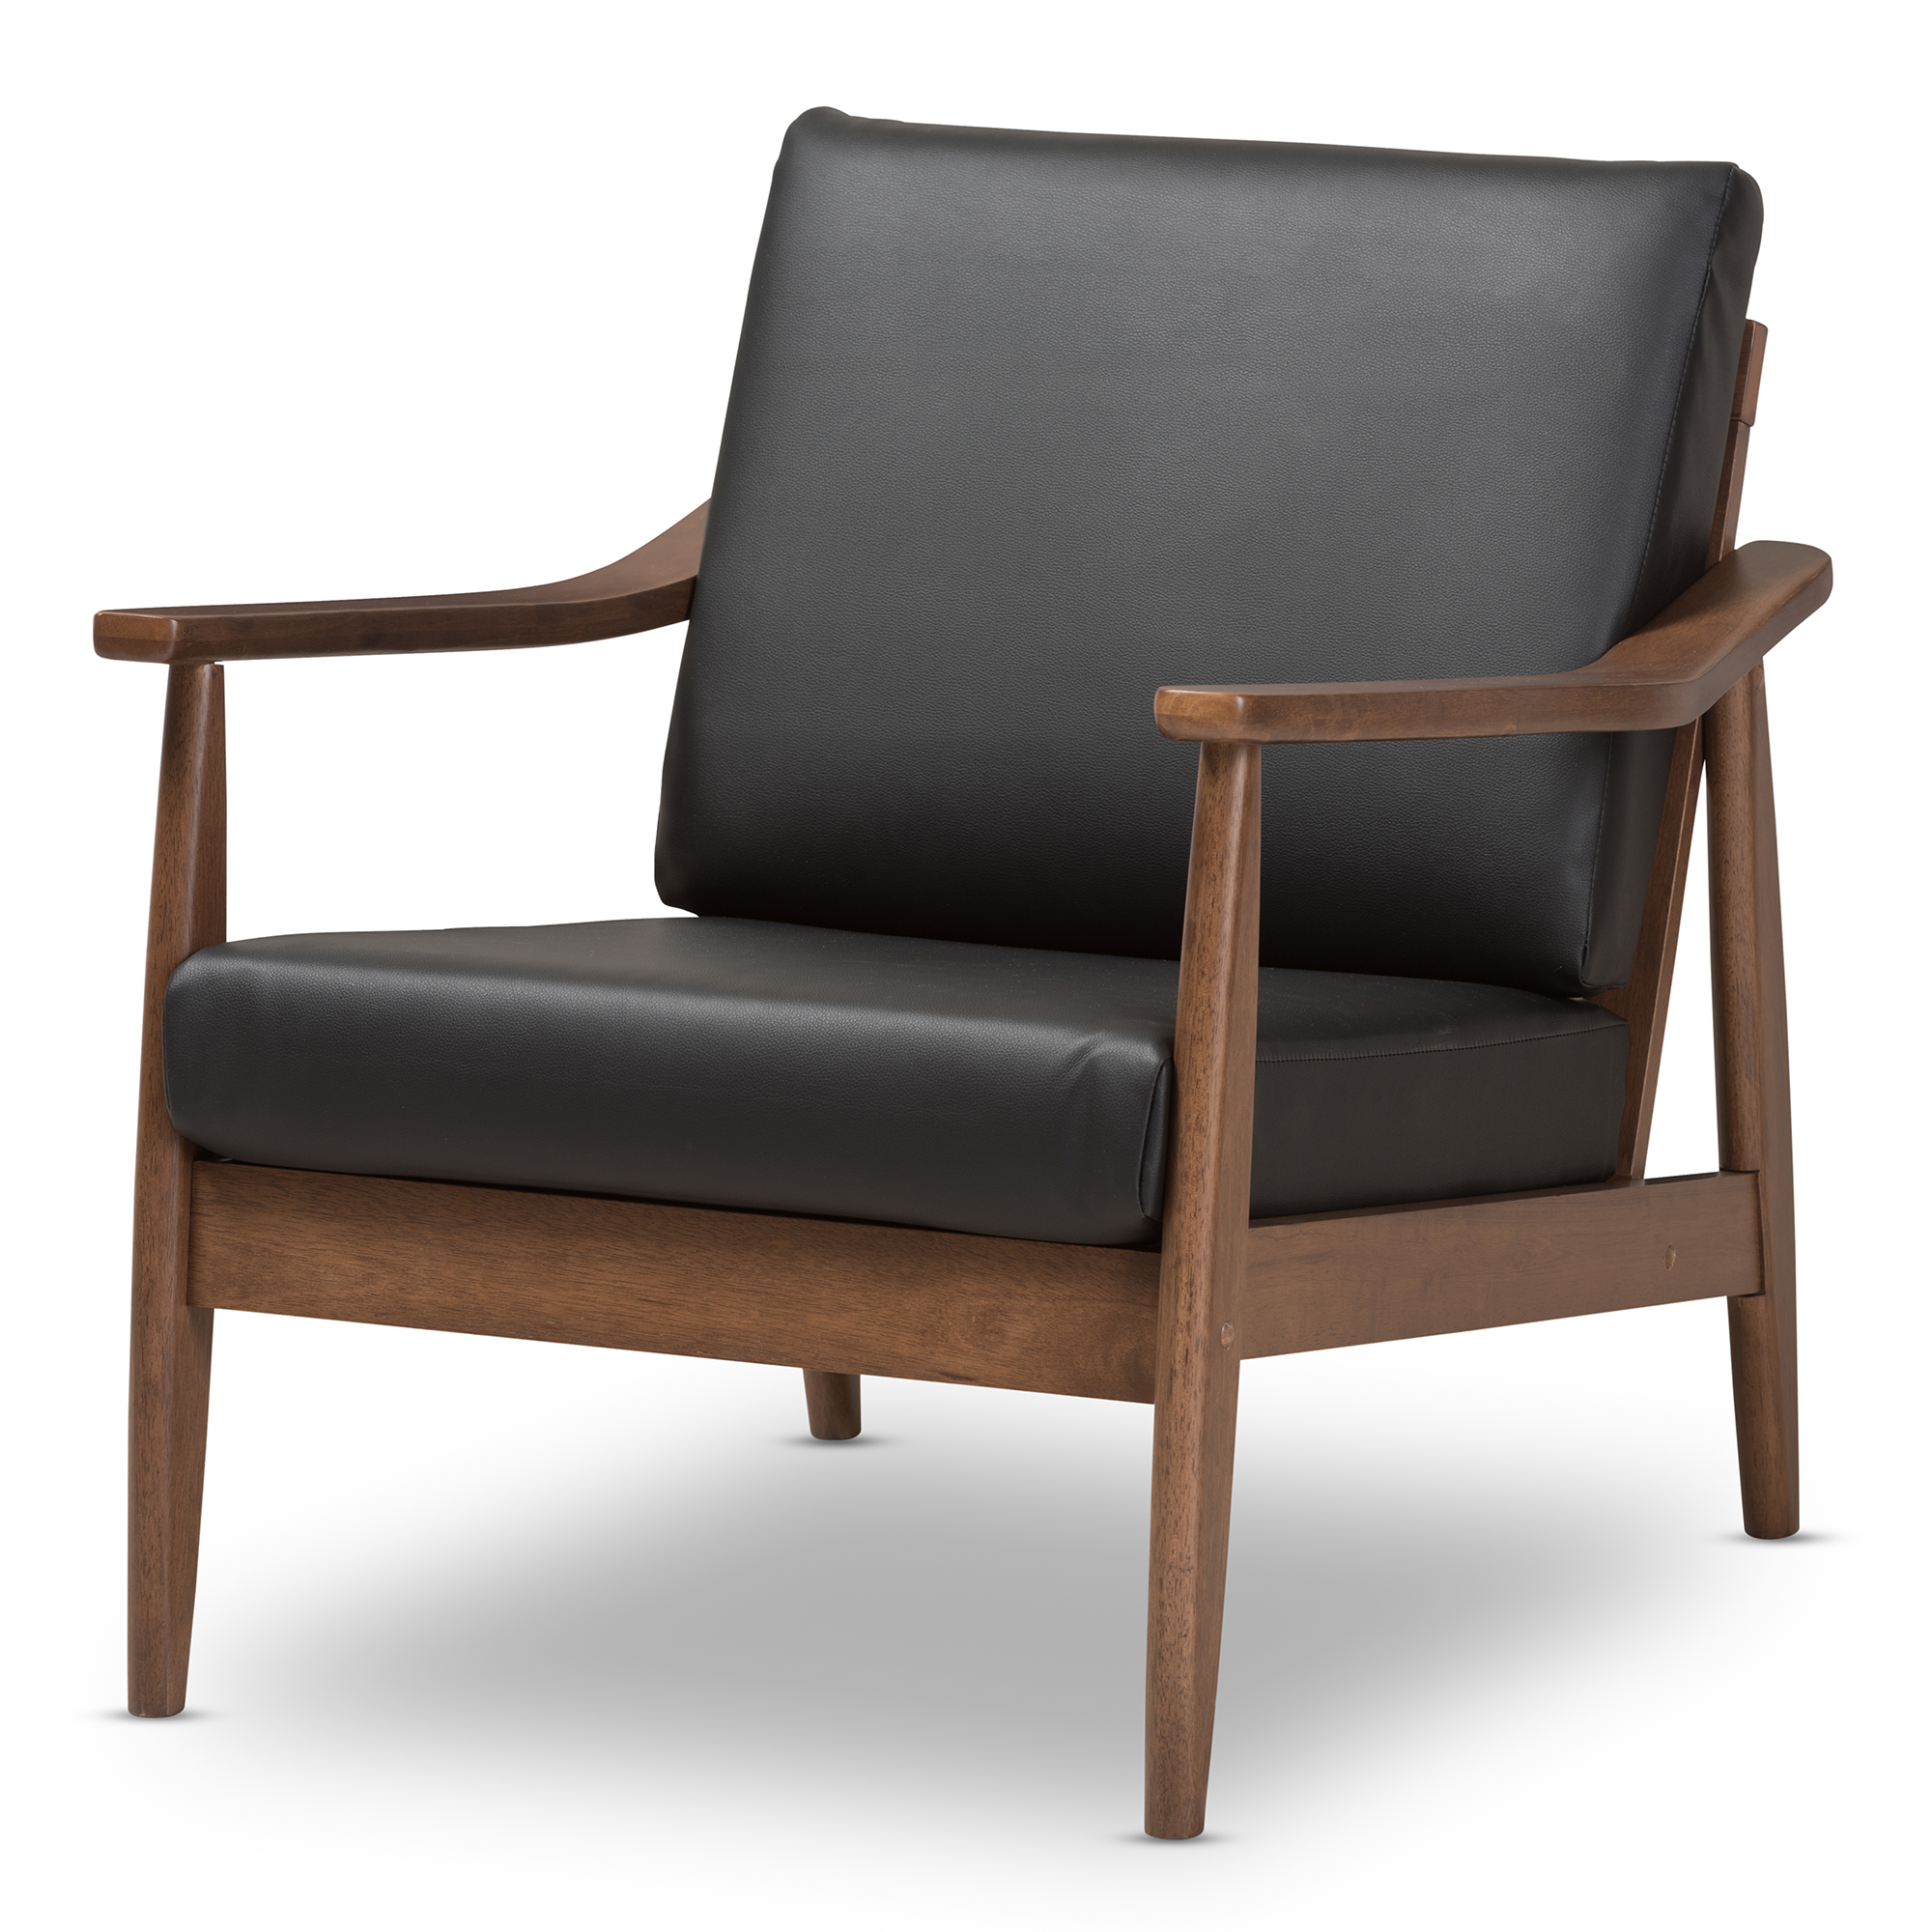 Superieur Baxton Studio Venza Mid Century Modern Walnut Wood Black Faux Leather  Lounge Chair